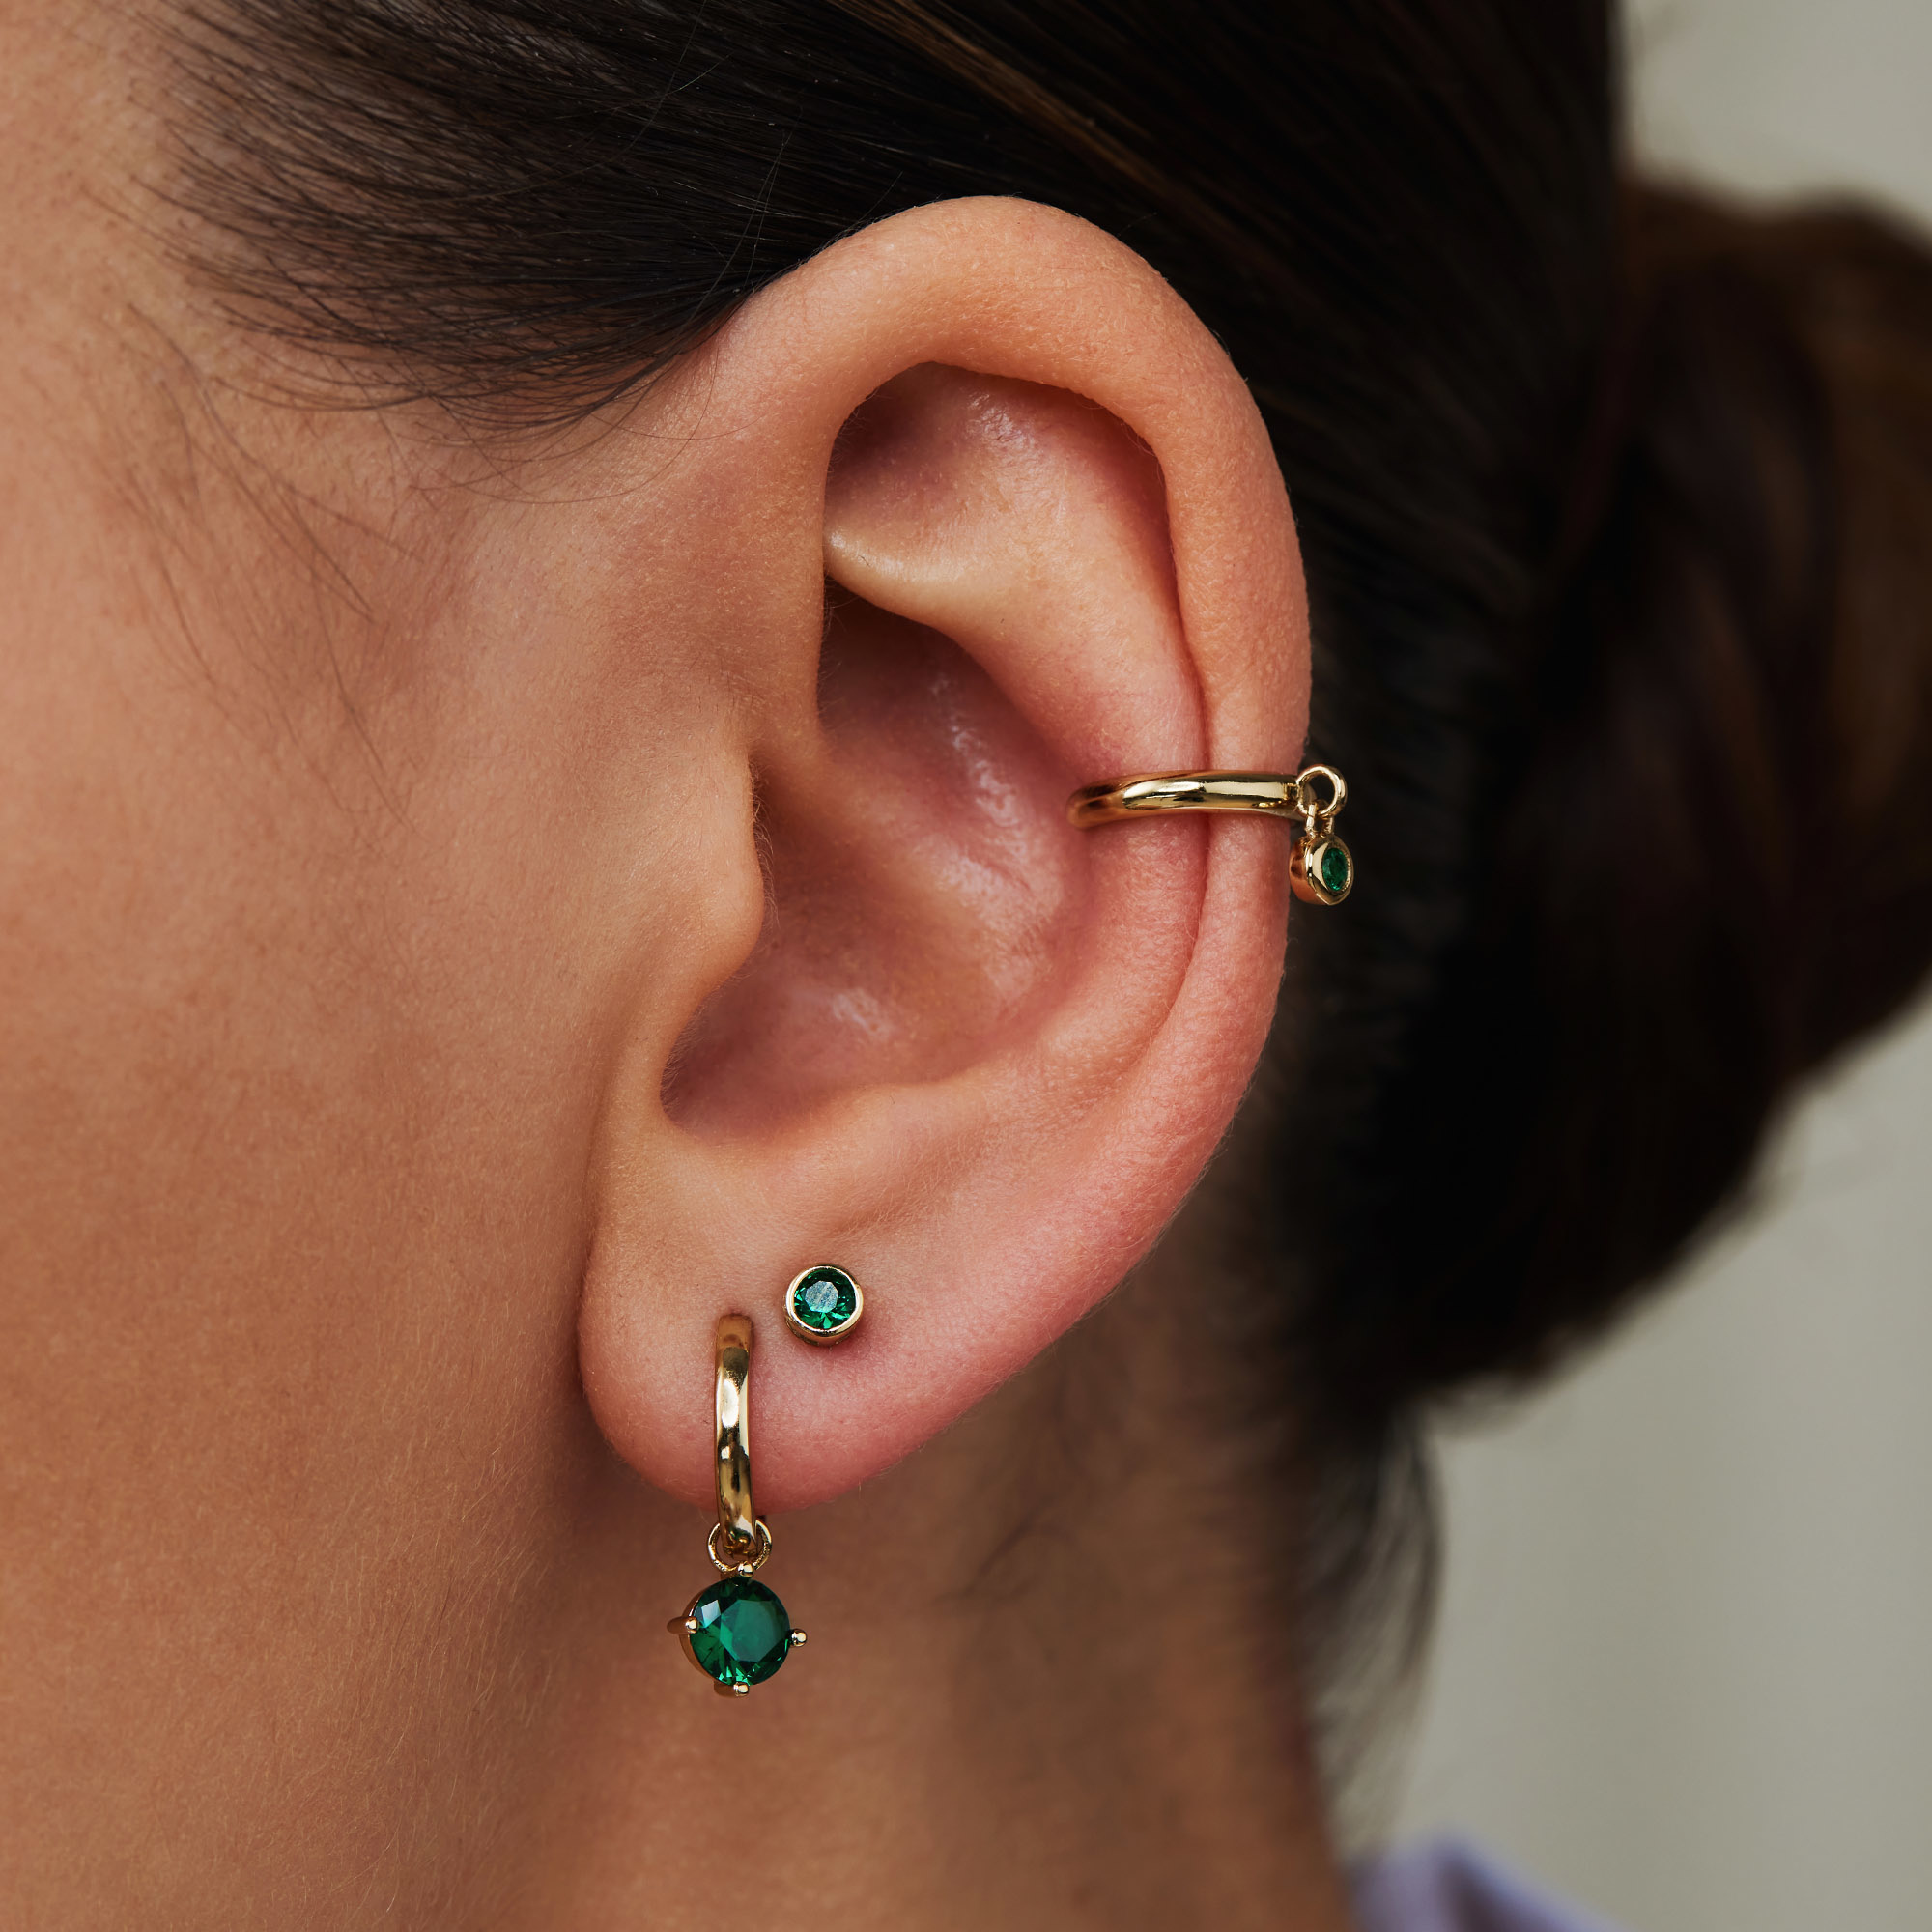 Violet Hamden Venus 925 sterling sølv guldfarvet ear cuff med fødselssten